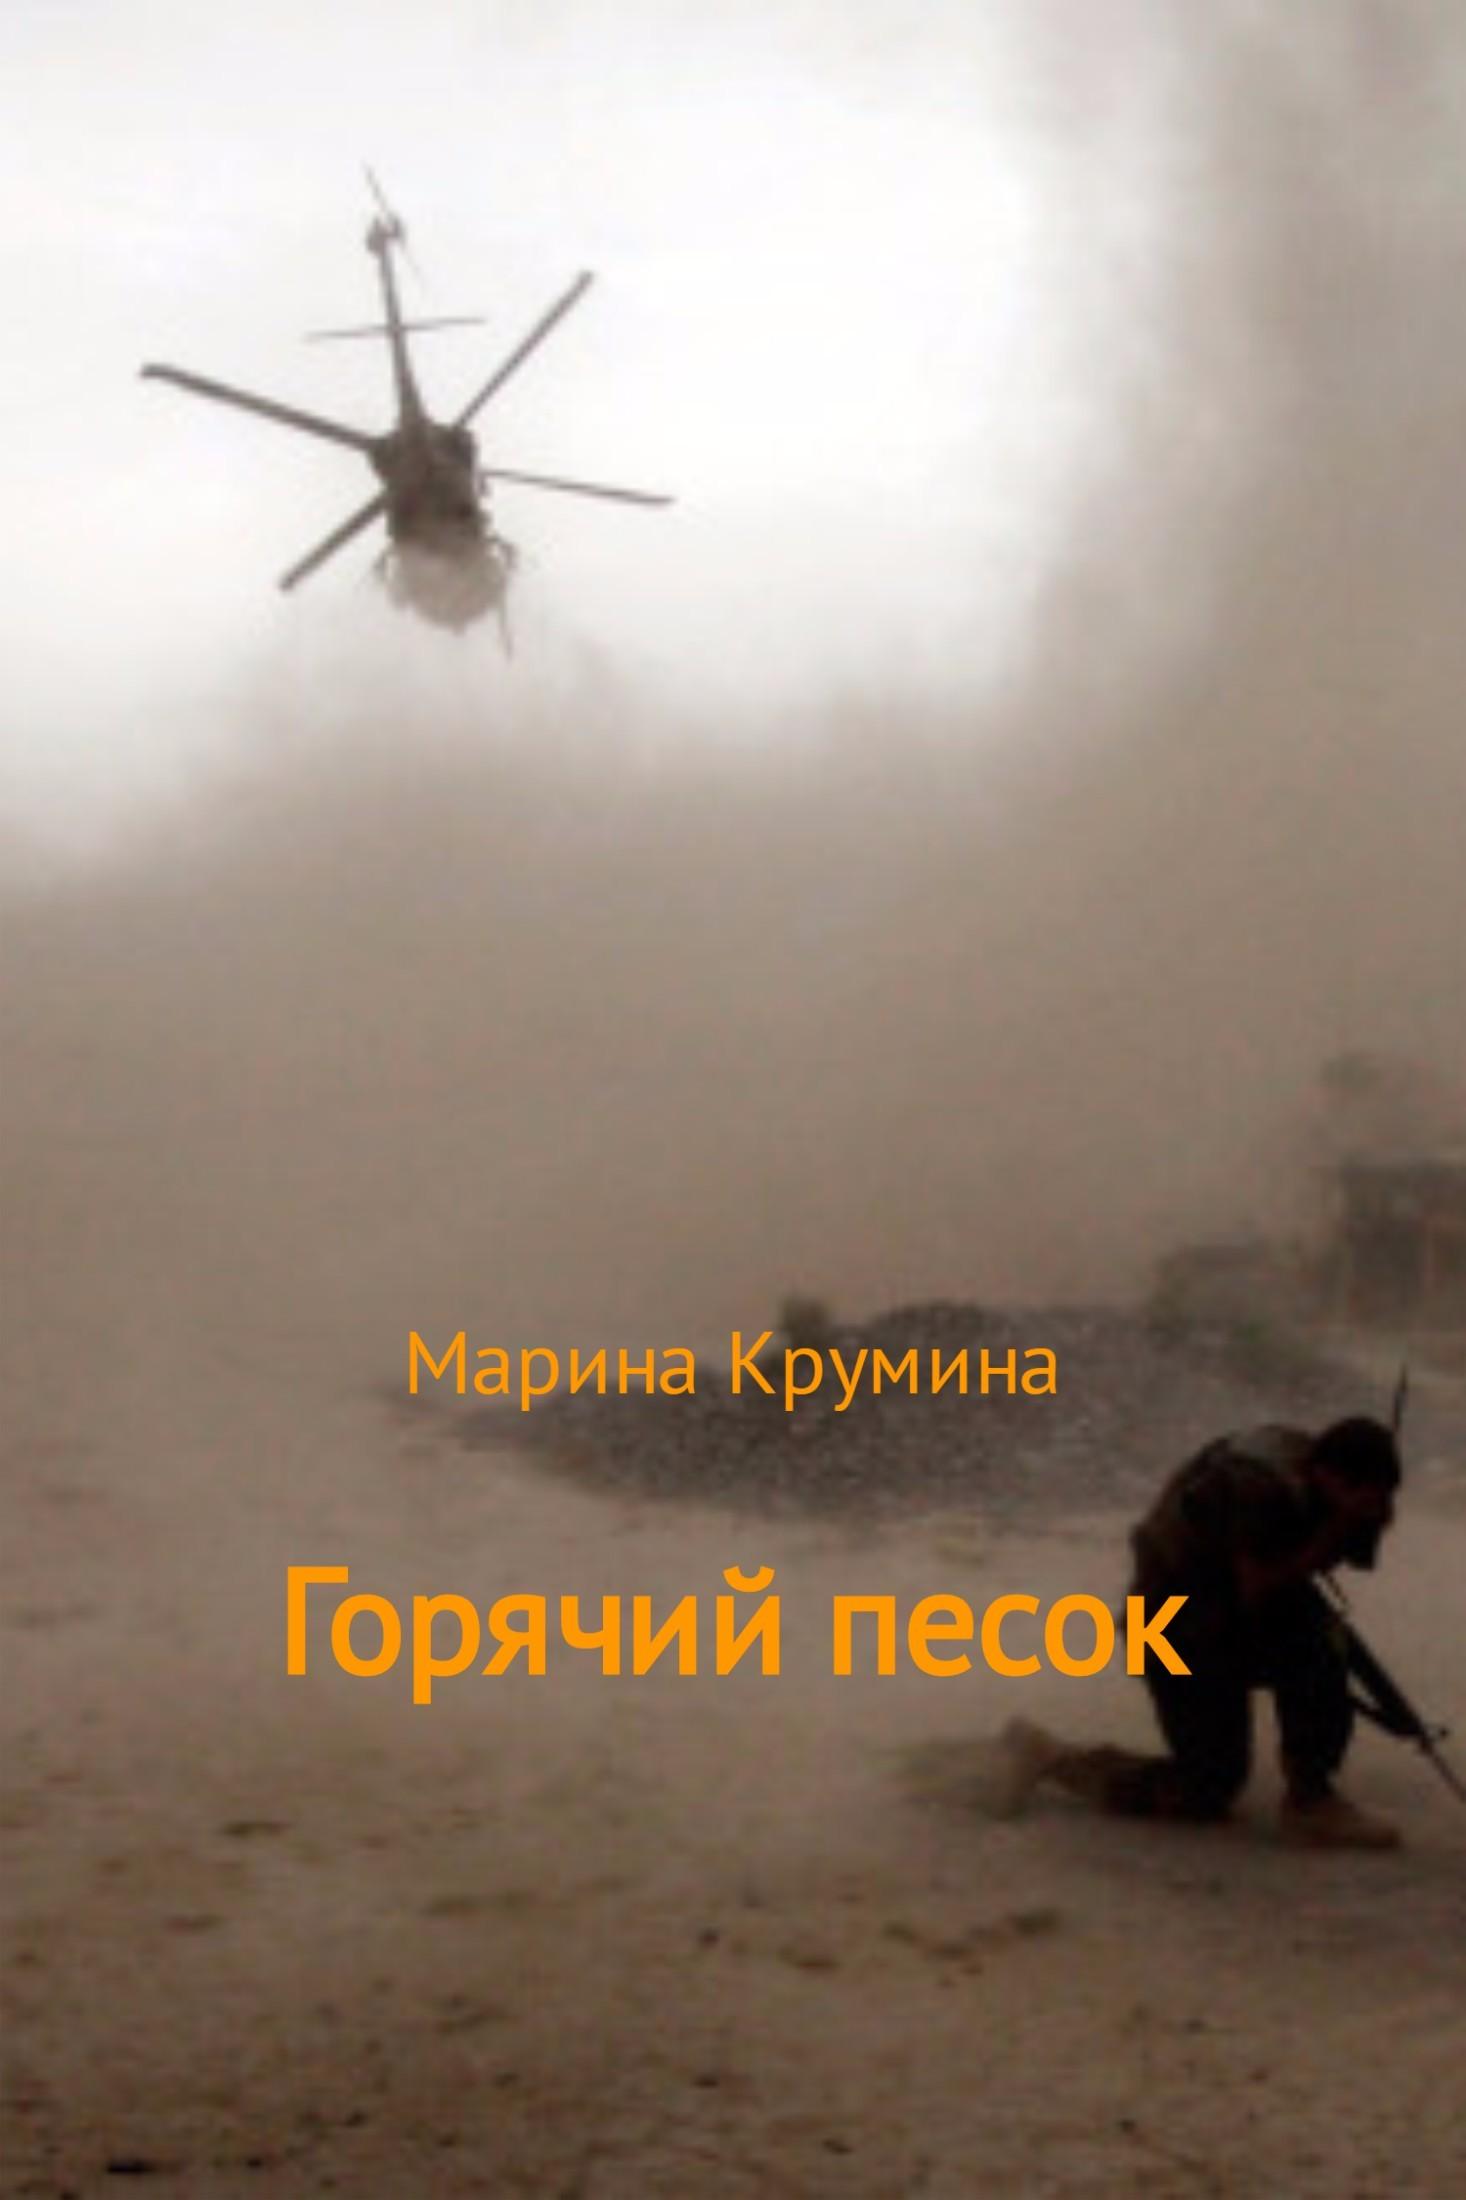 Марина Петровна Крумина бесплатно